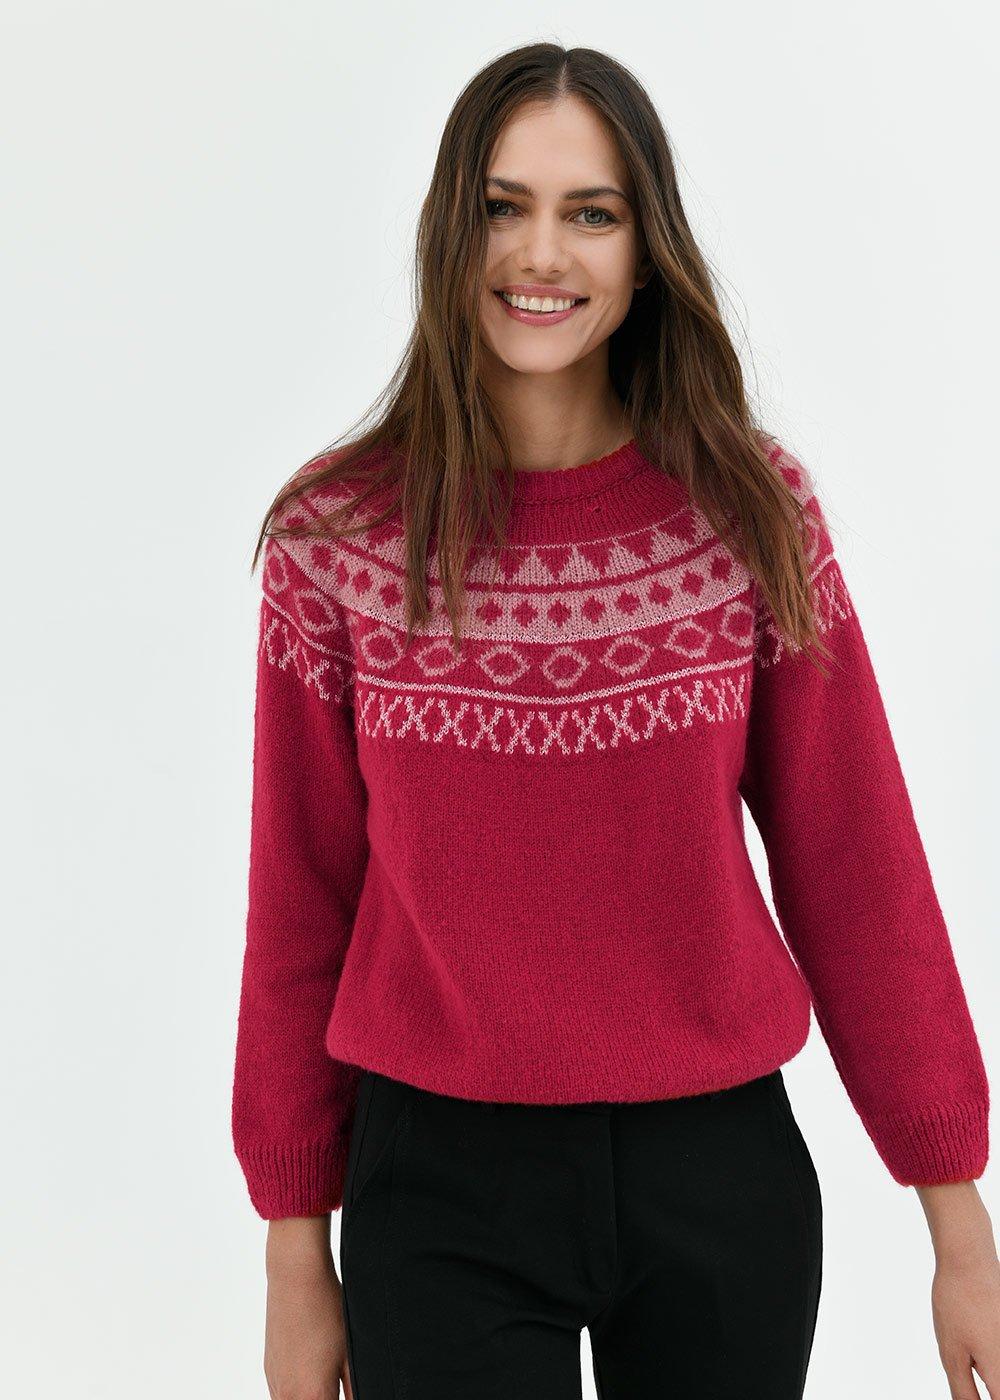 Merida wool sweater with Norwegian pattern - Porpora / Silver / Fantasia - Woman